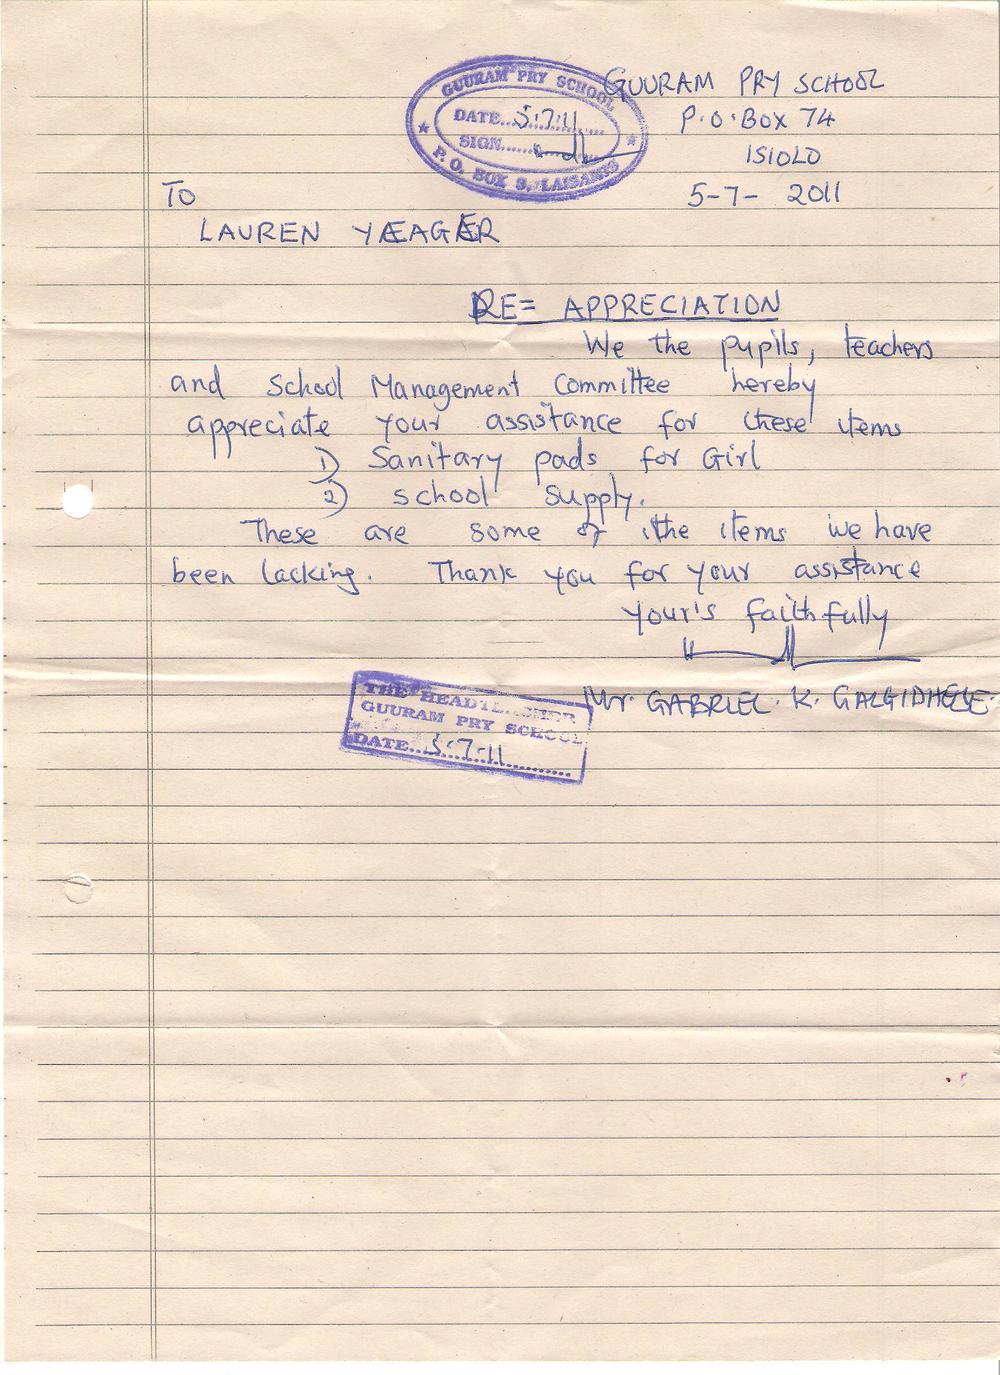 Letter to Lauren Yeager.jpg